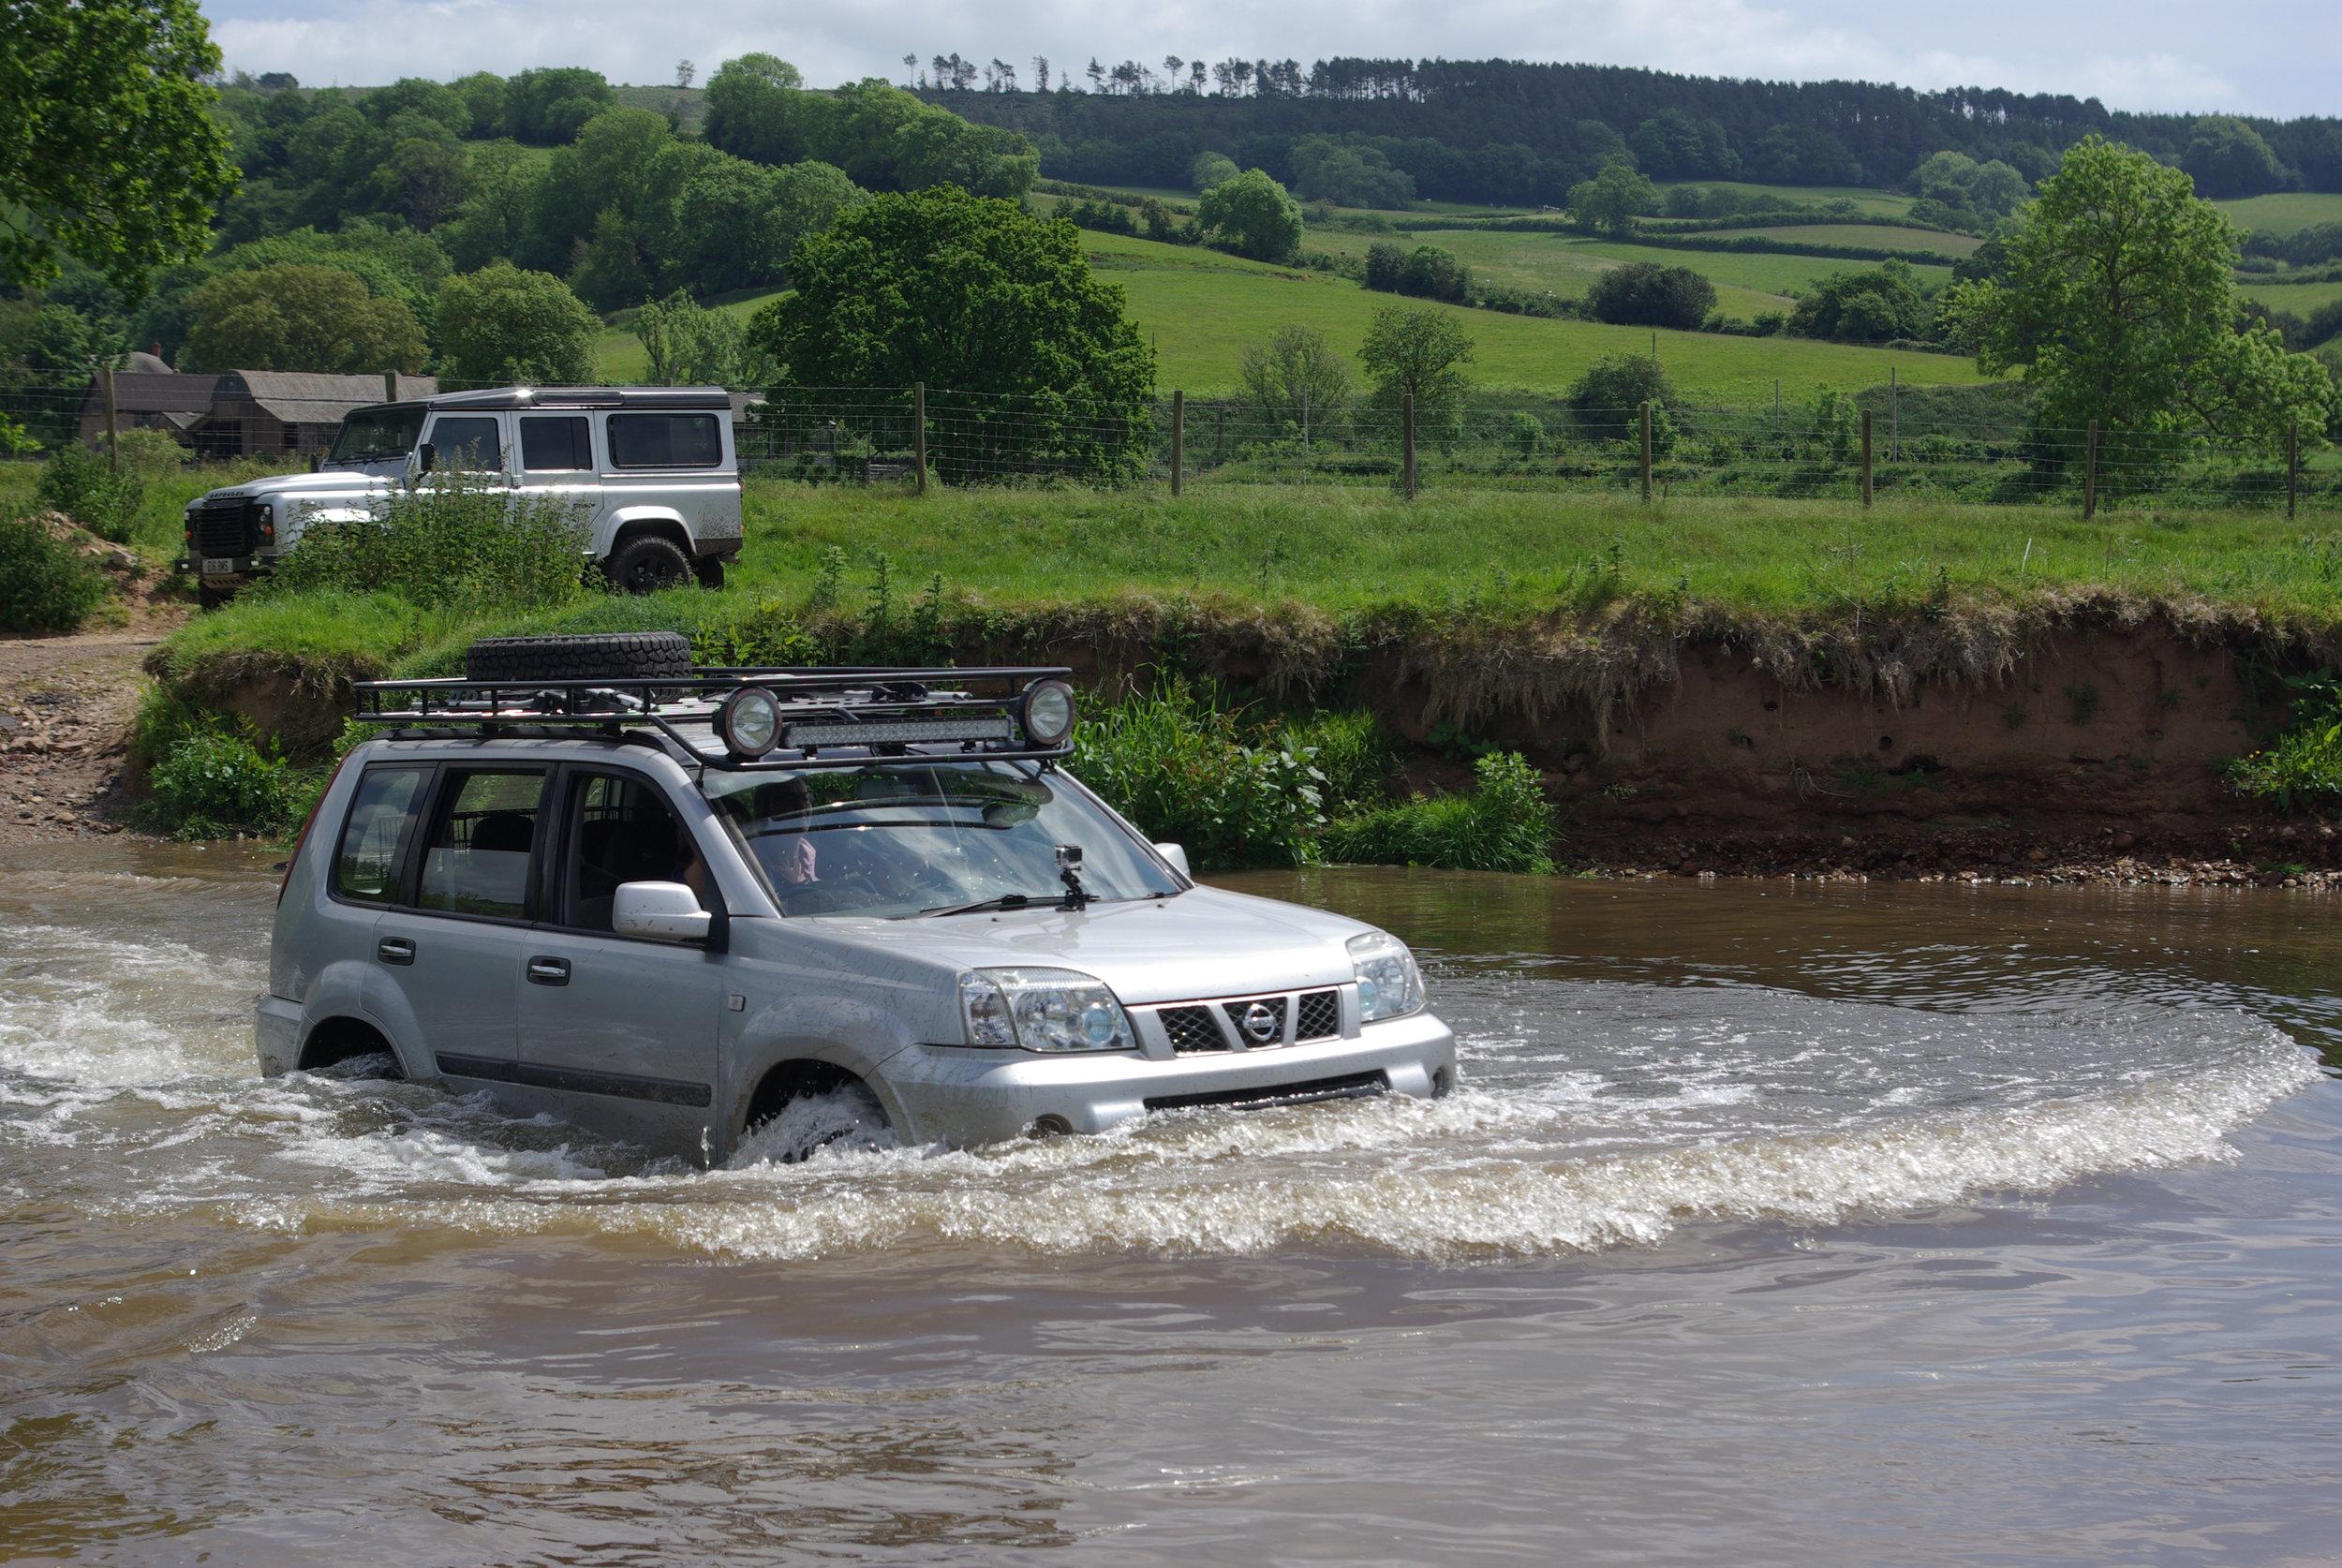 Ford across the River Otter, South Devon in June 2015